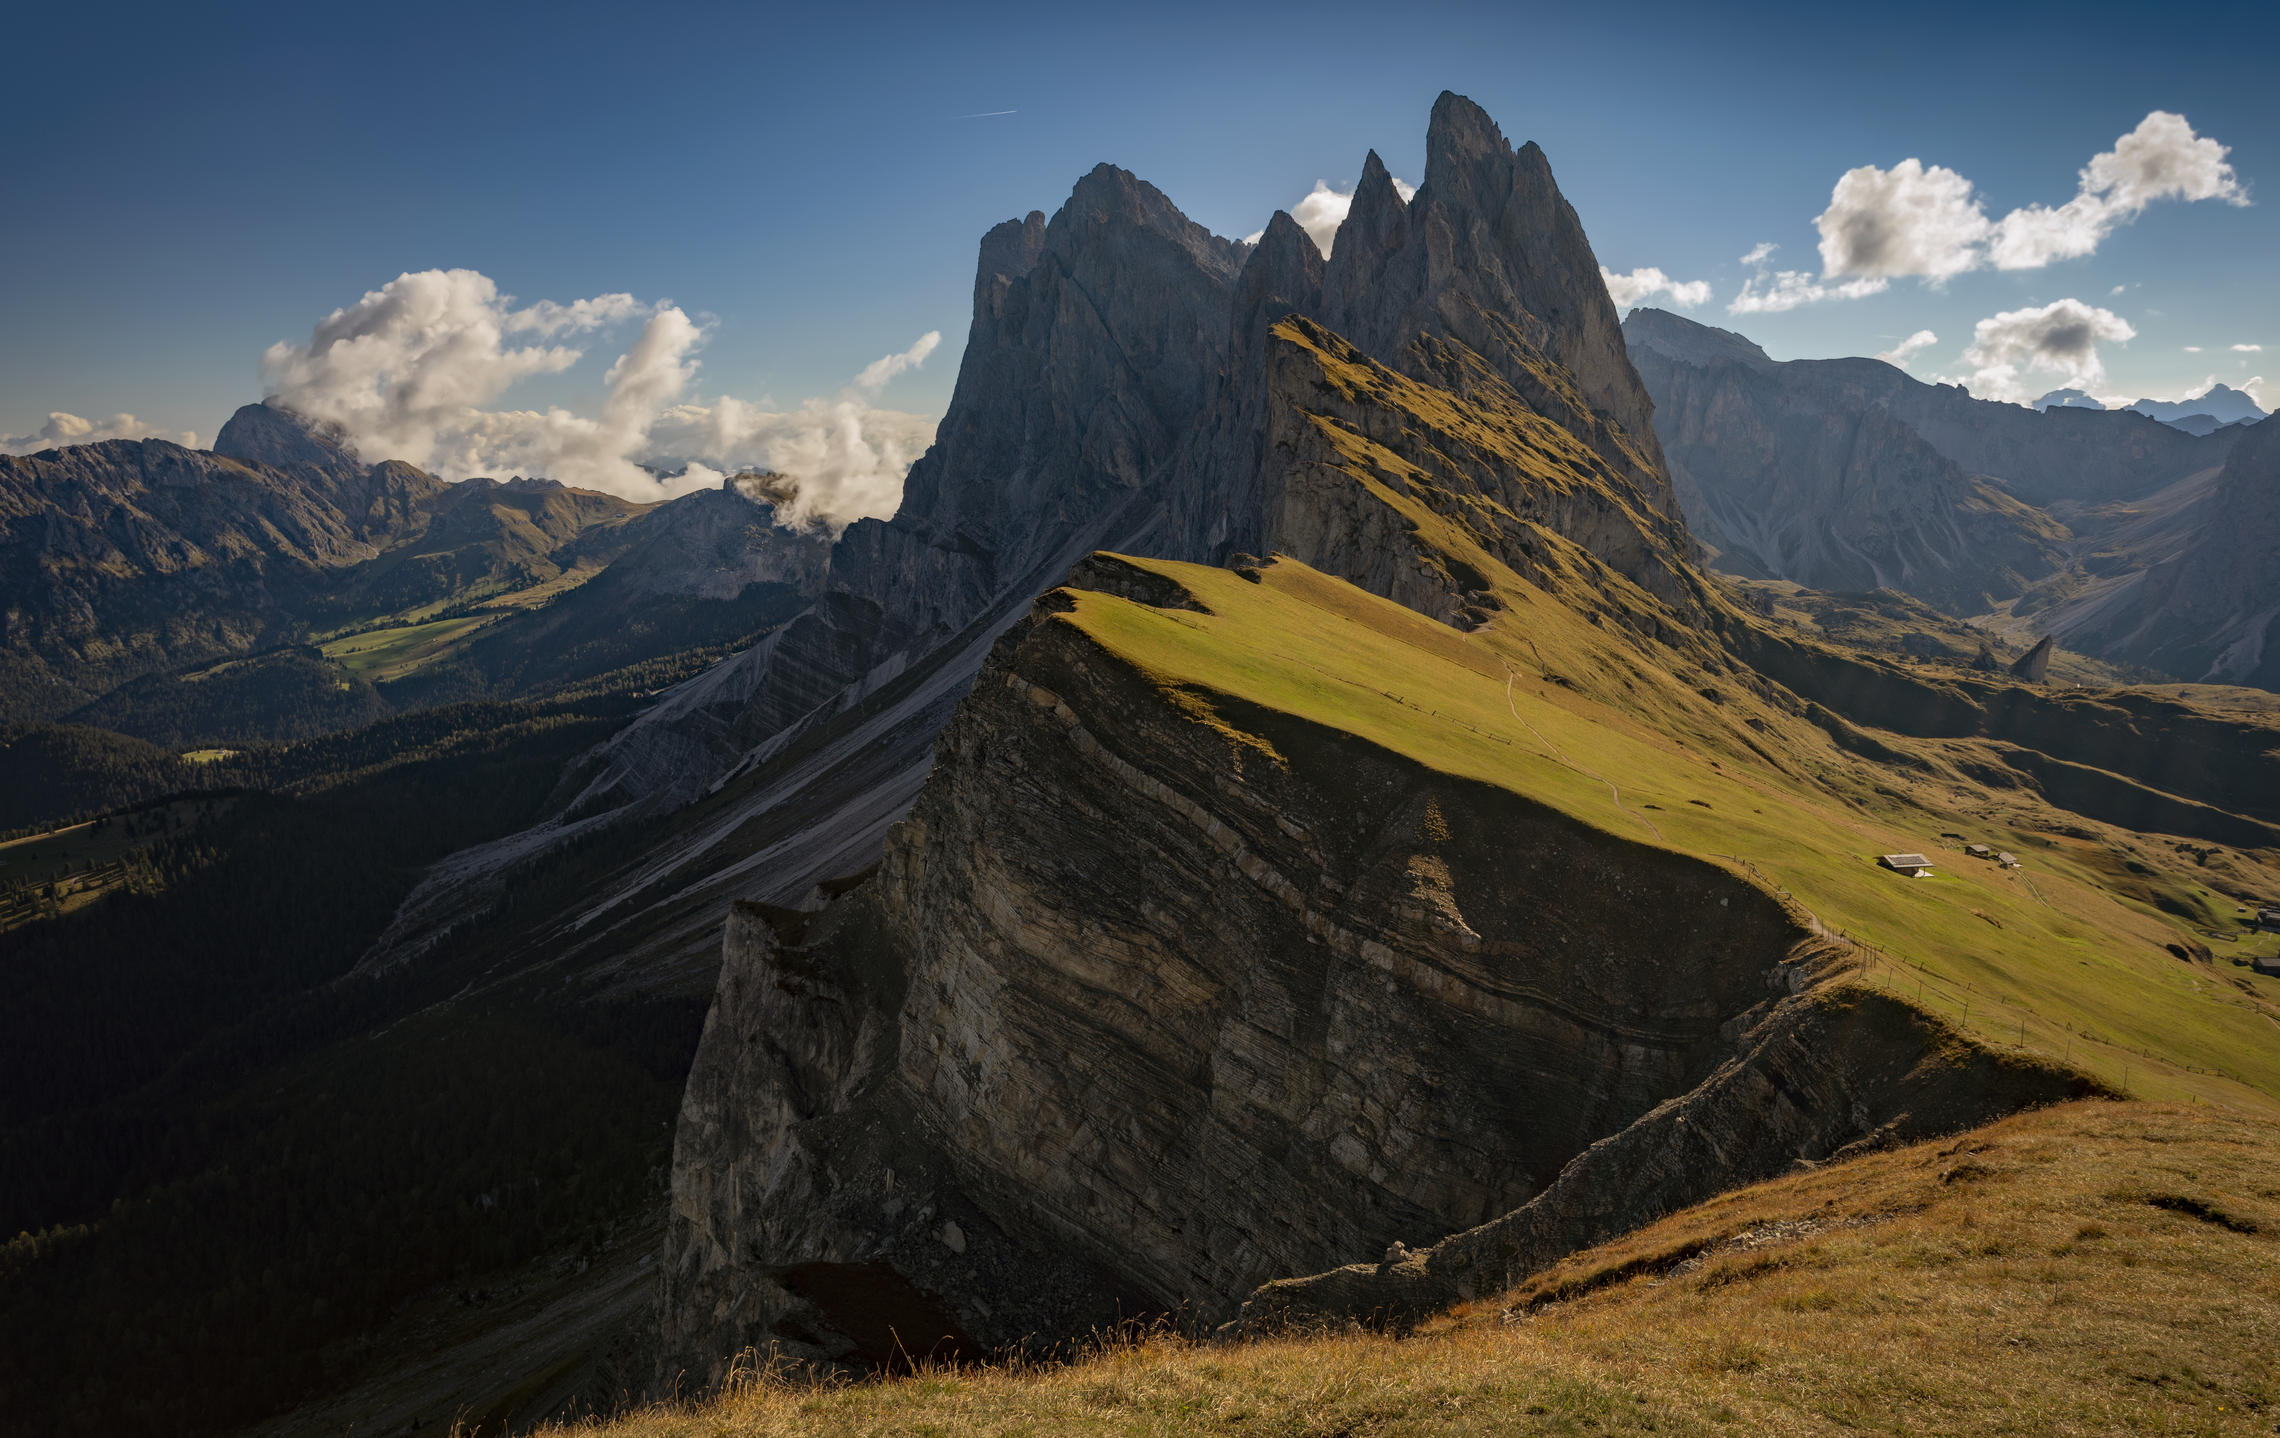 италия, альпы, Alexandr Bezmolitvenny